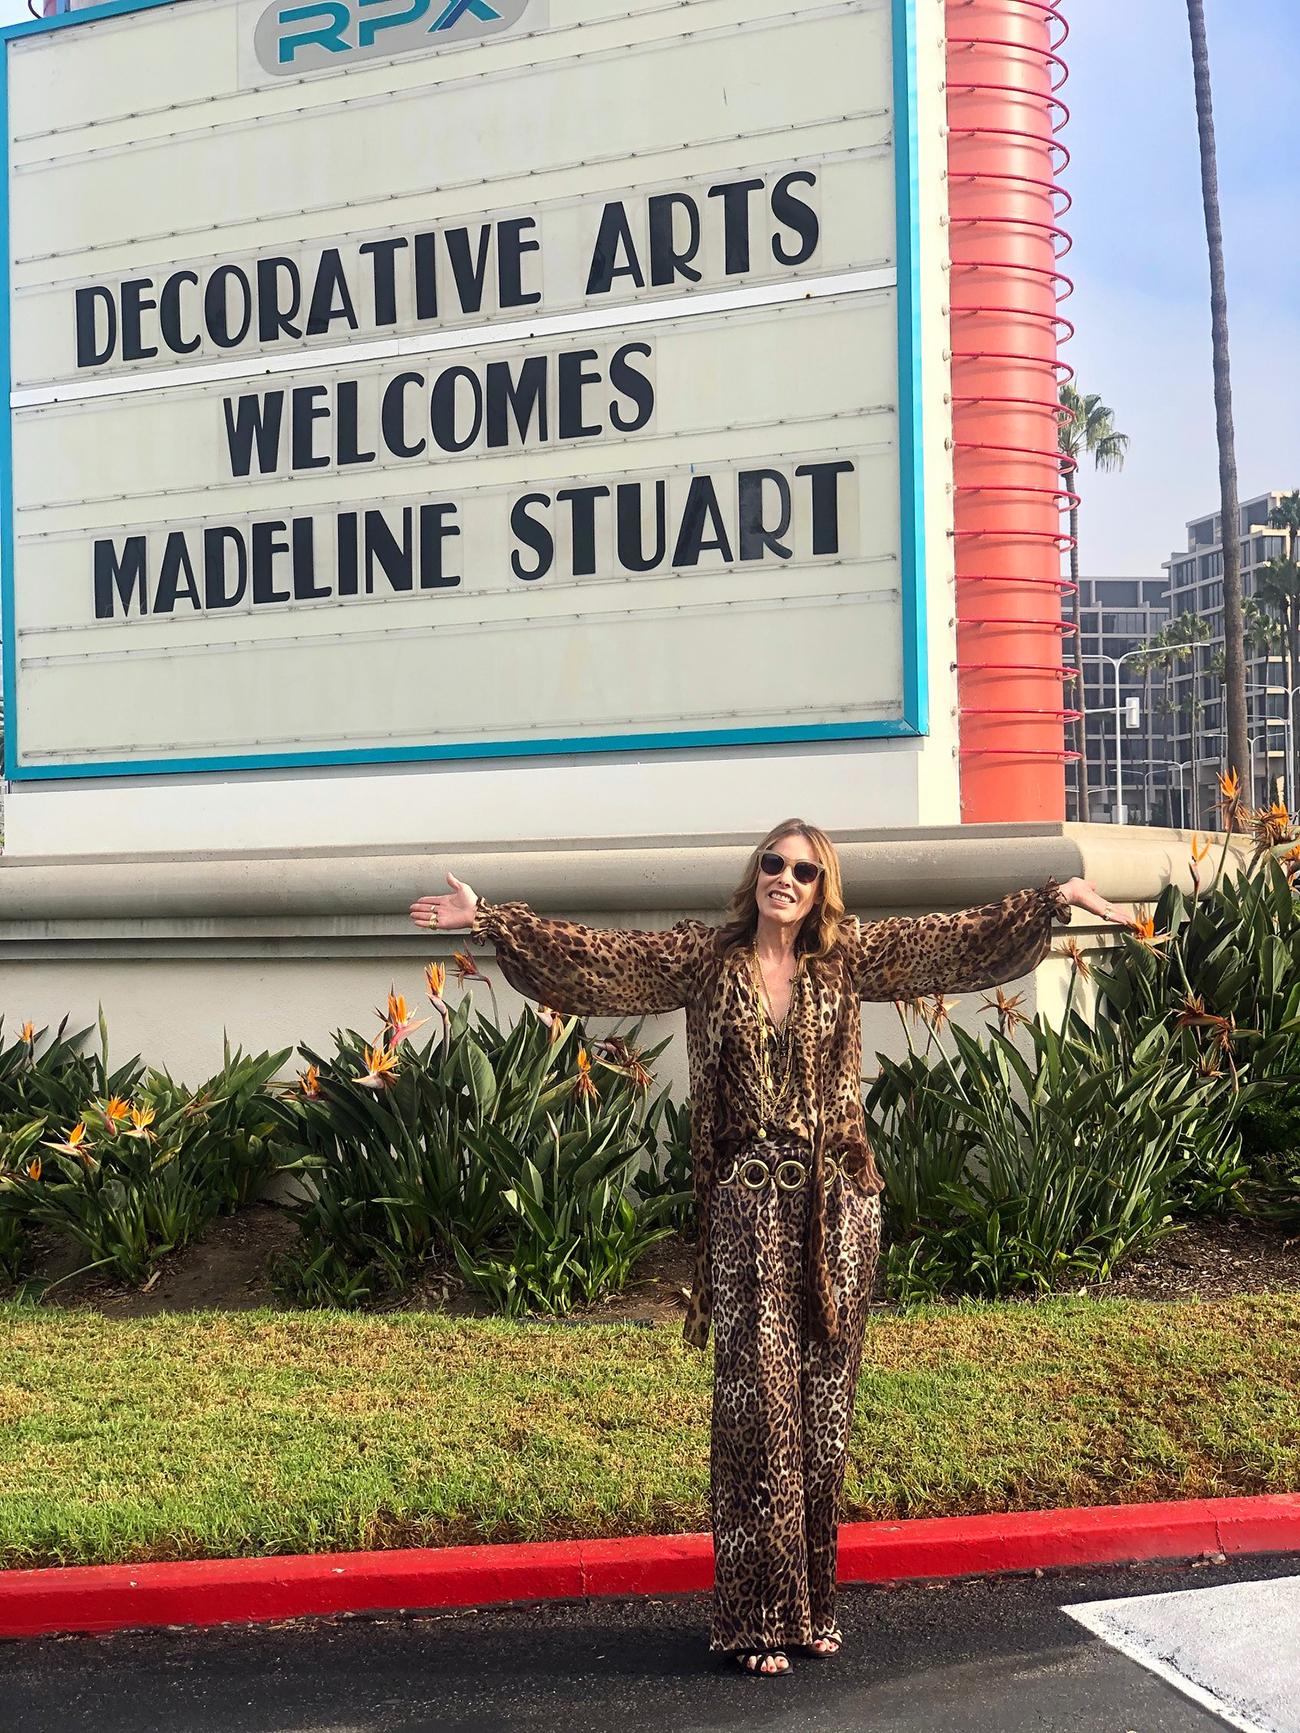 Decorative Arts Society in Newport Beach